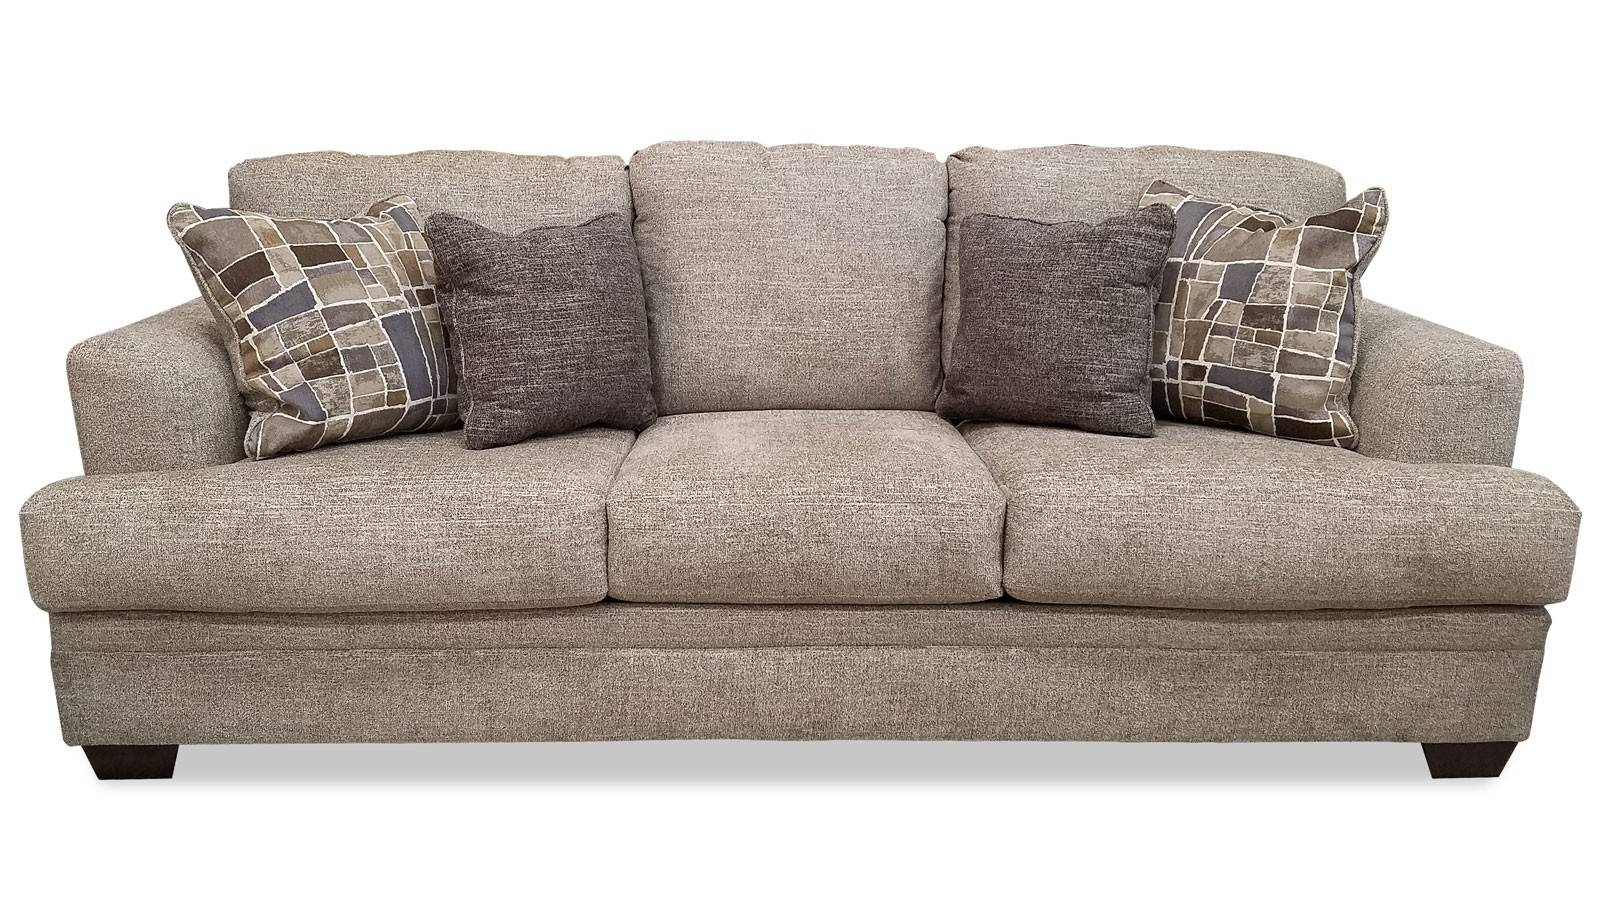 12 foot sofa danish leather melbourne 2019 popular 6 sofas